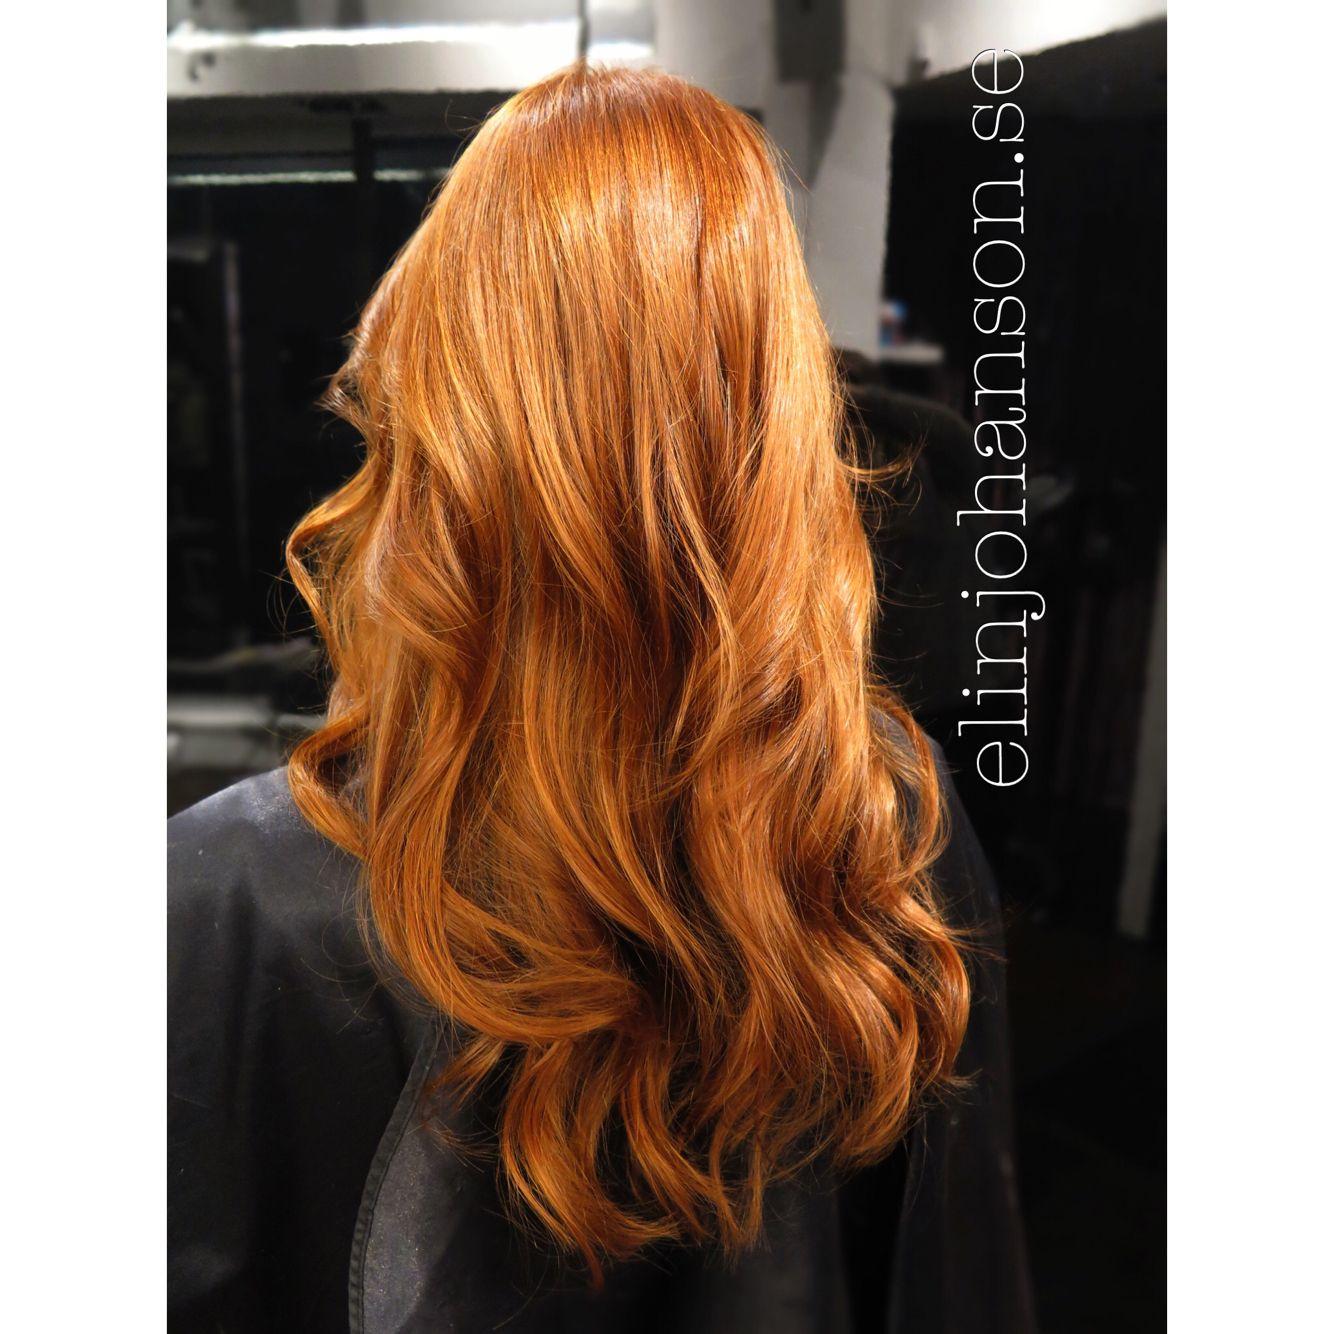 Ginger hair // #gingerhair #ginger #hairstyles